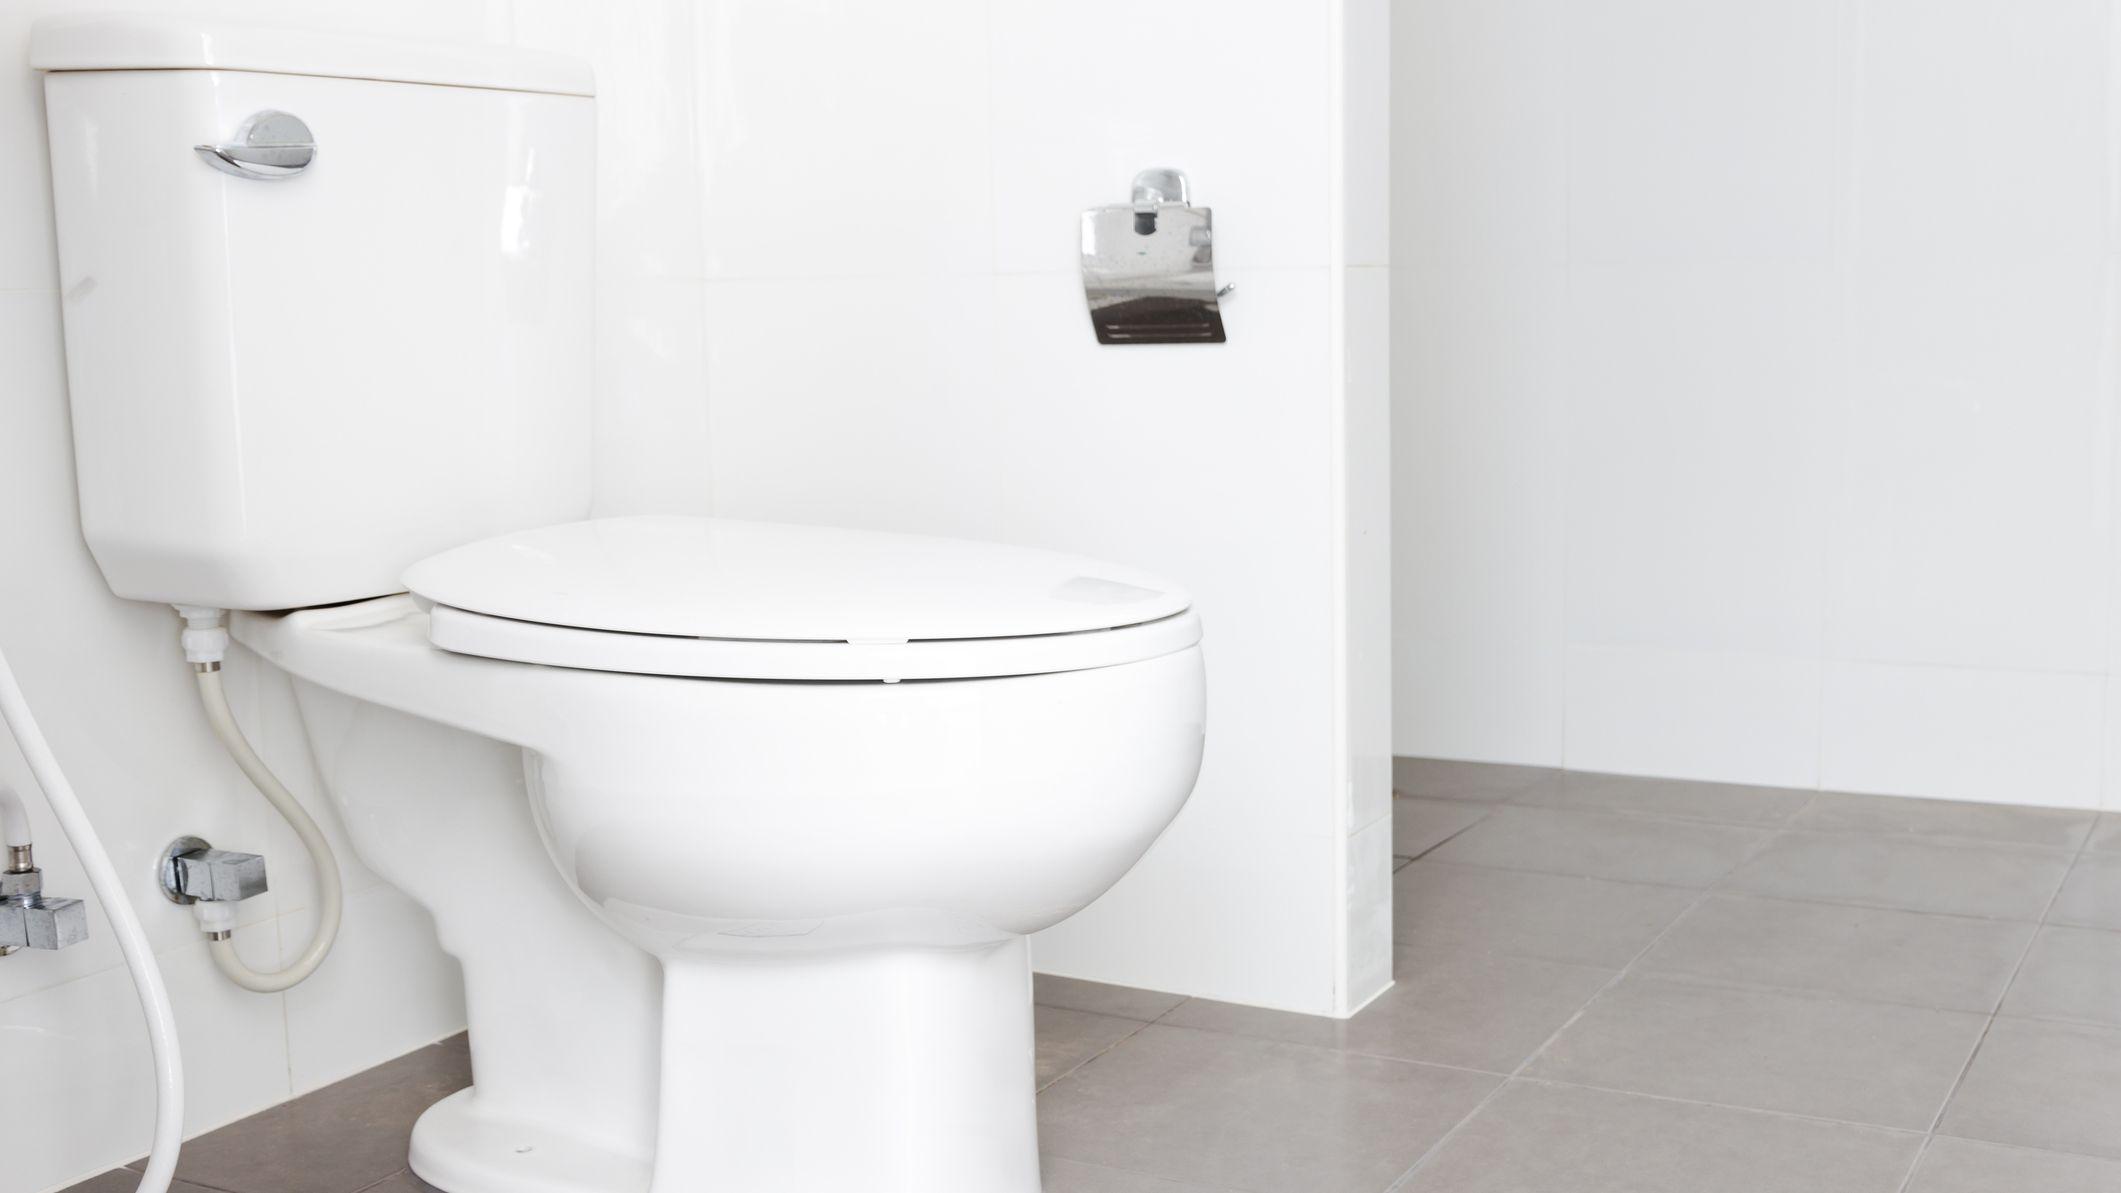 Types Of Toilet Handles